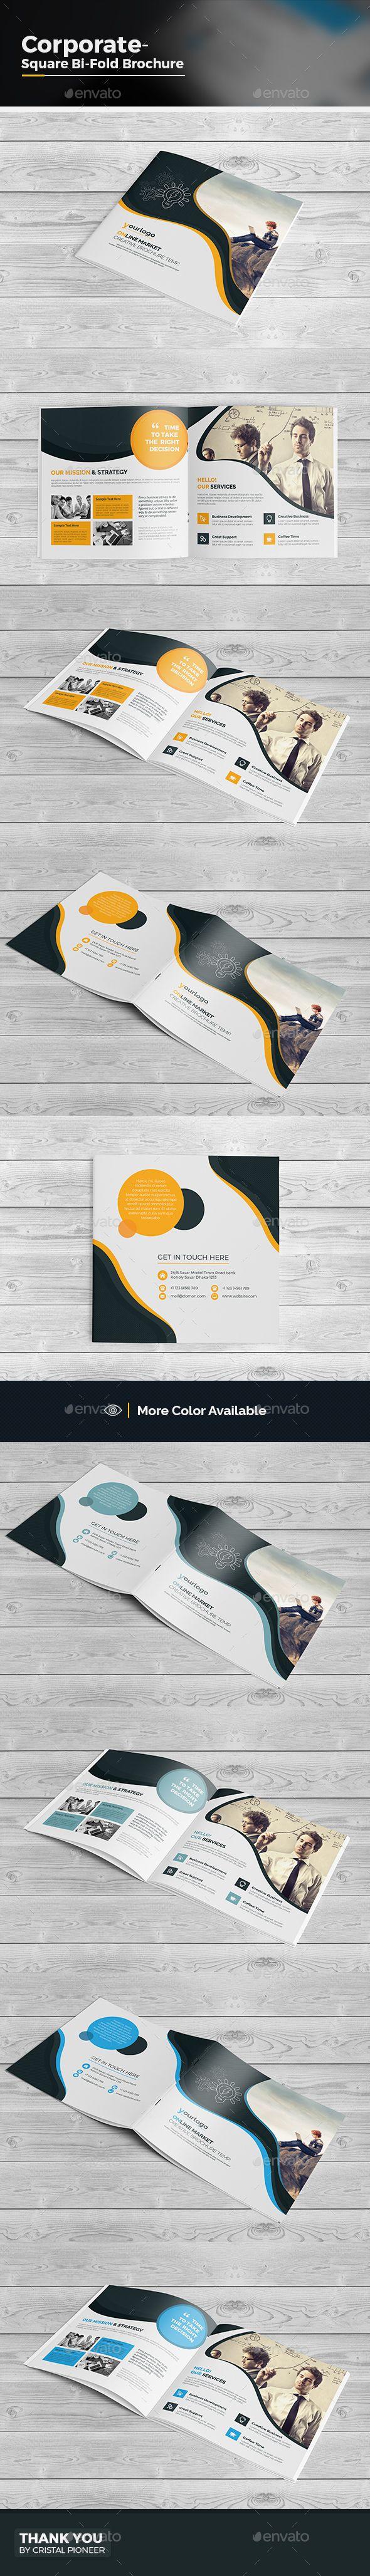 Multipurpose Square Bi Fold Brochure  — EPS Template #elegant #bi fold square • Download ➝ https://graphicriver.net/item/multipurpose-square-bi-fold-brochure/18335763?ref=pxcr